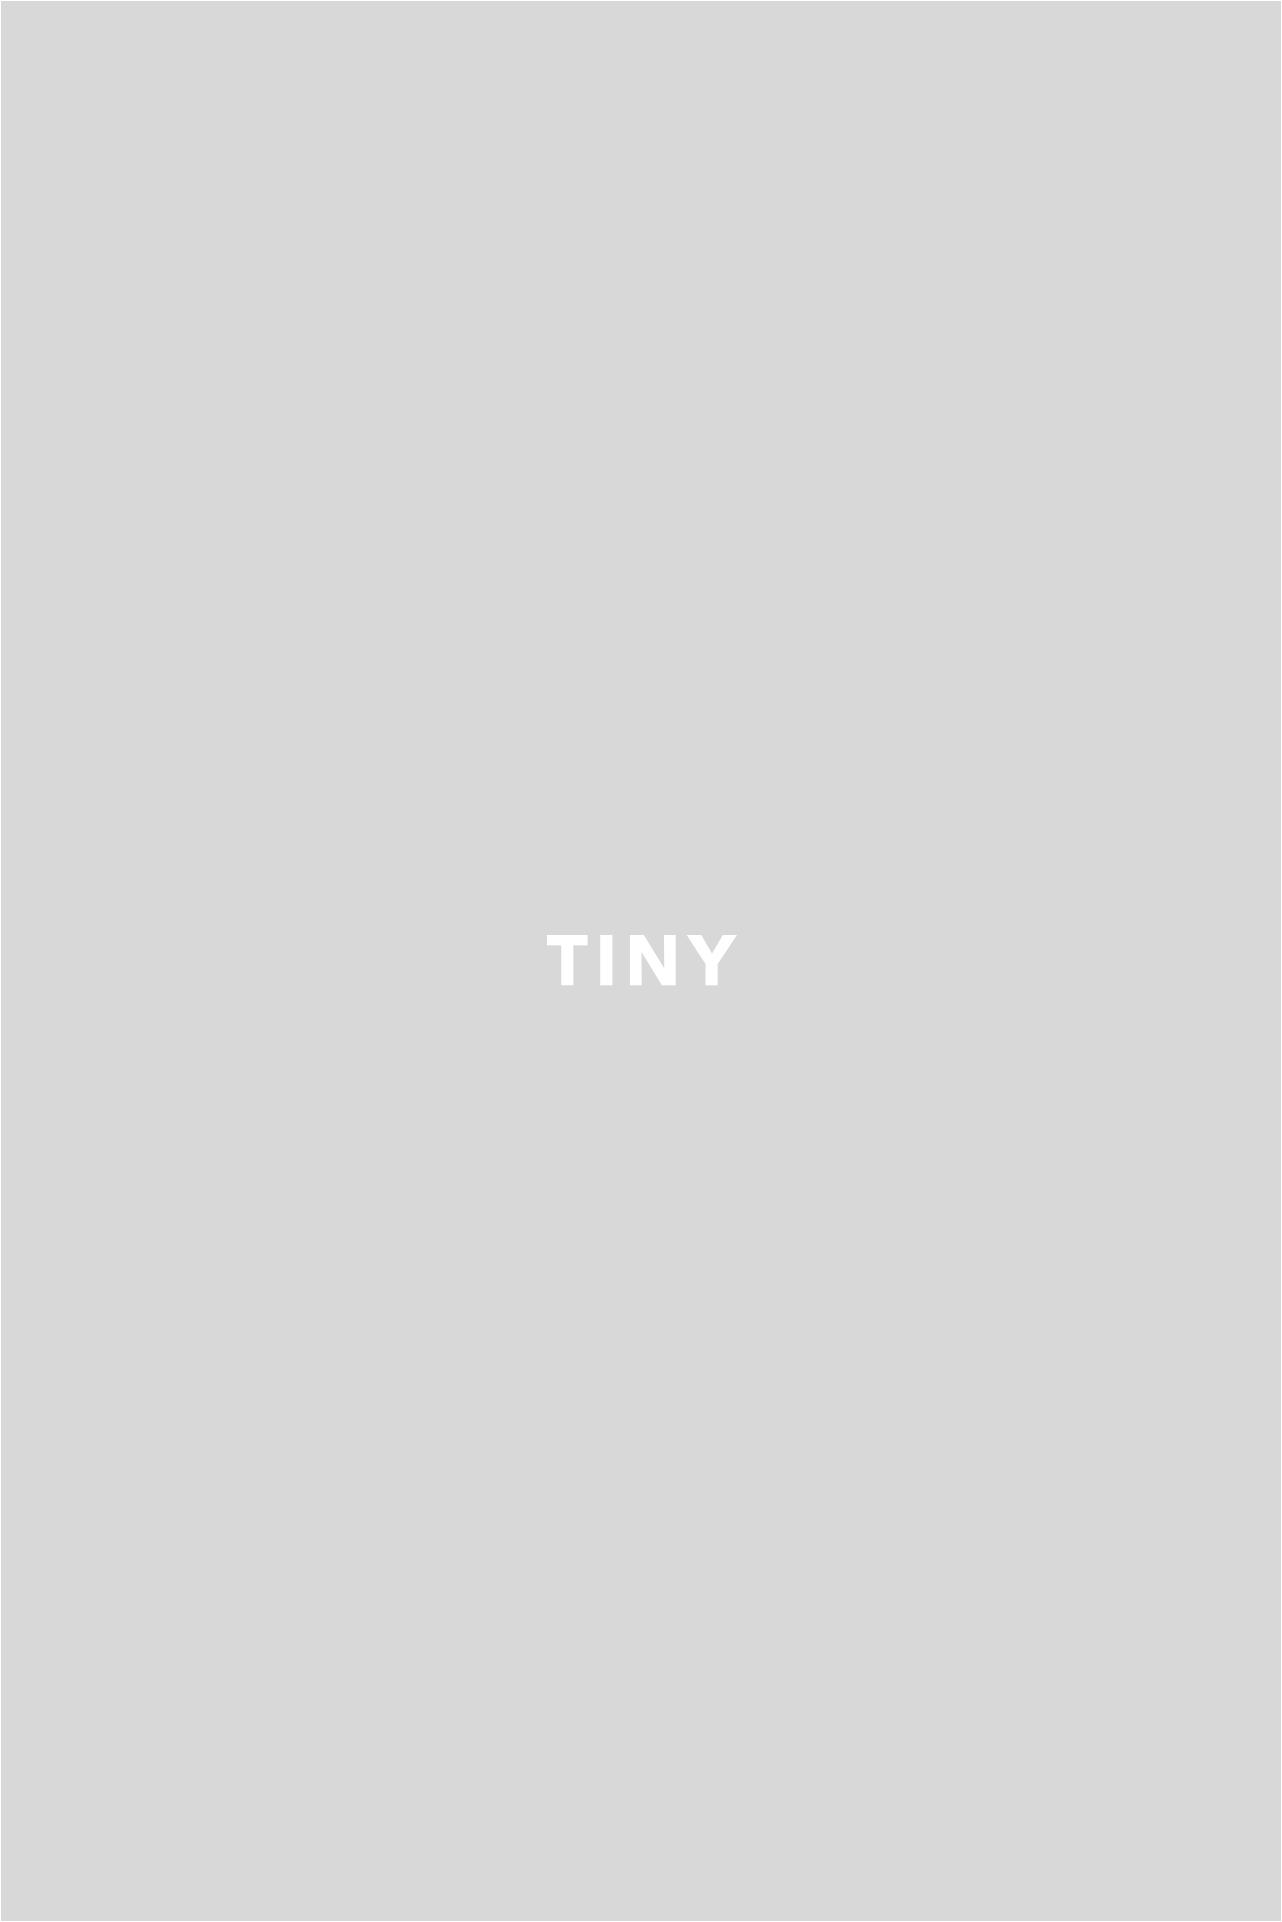 Wonky Fruits & Vegetables